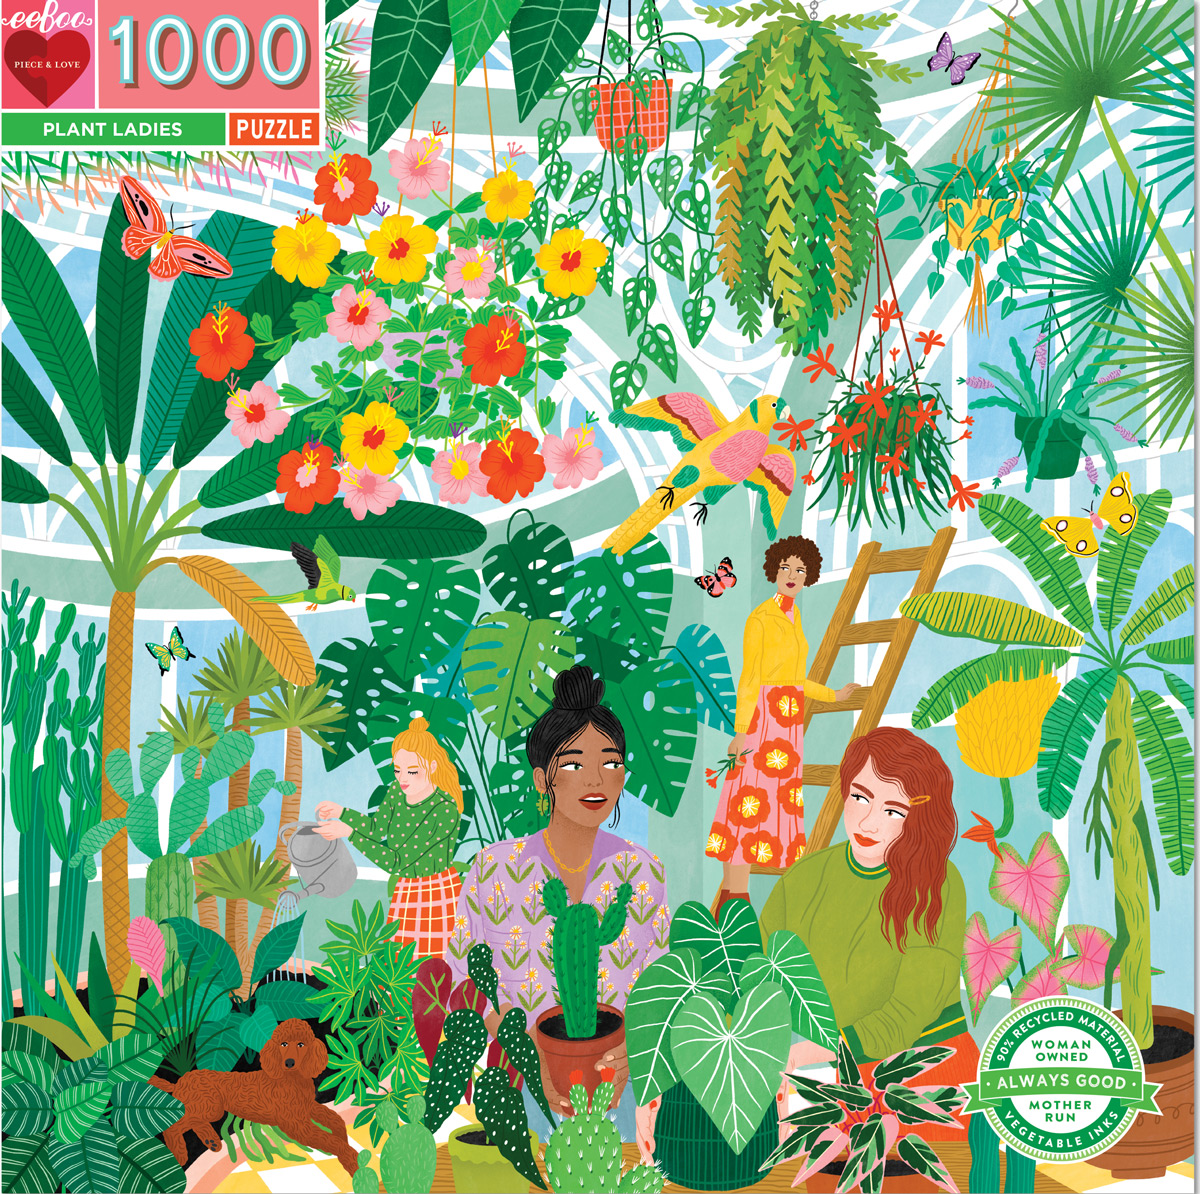 Plant Ladies Flowers Jigsaw Puzzle